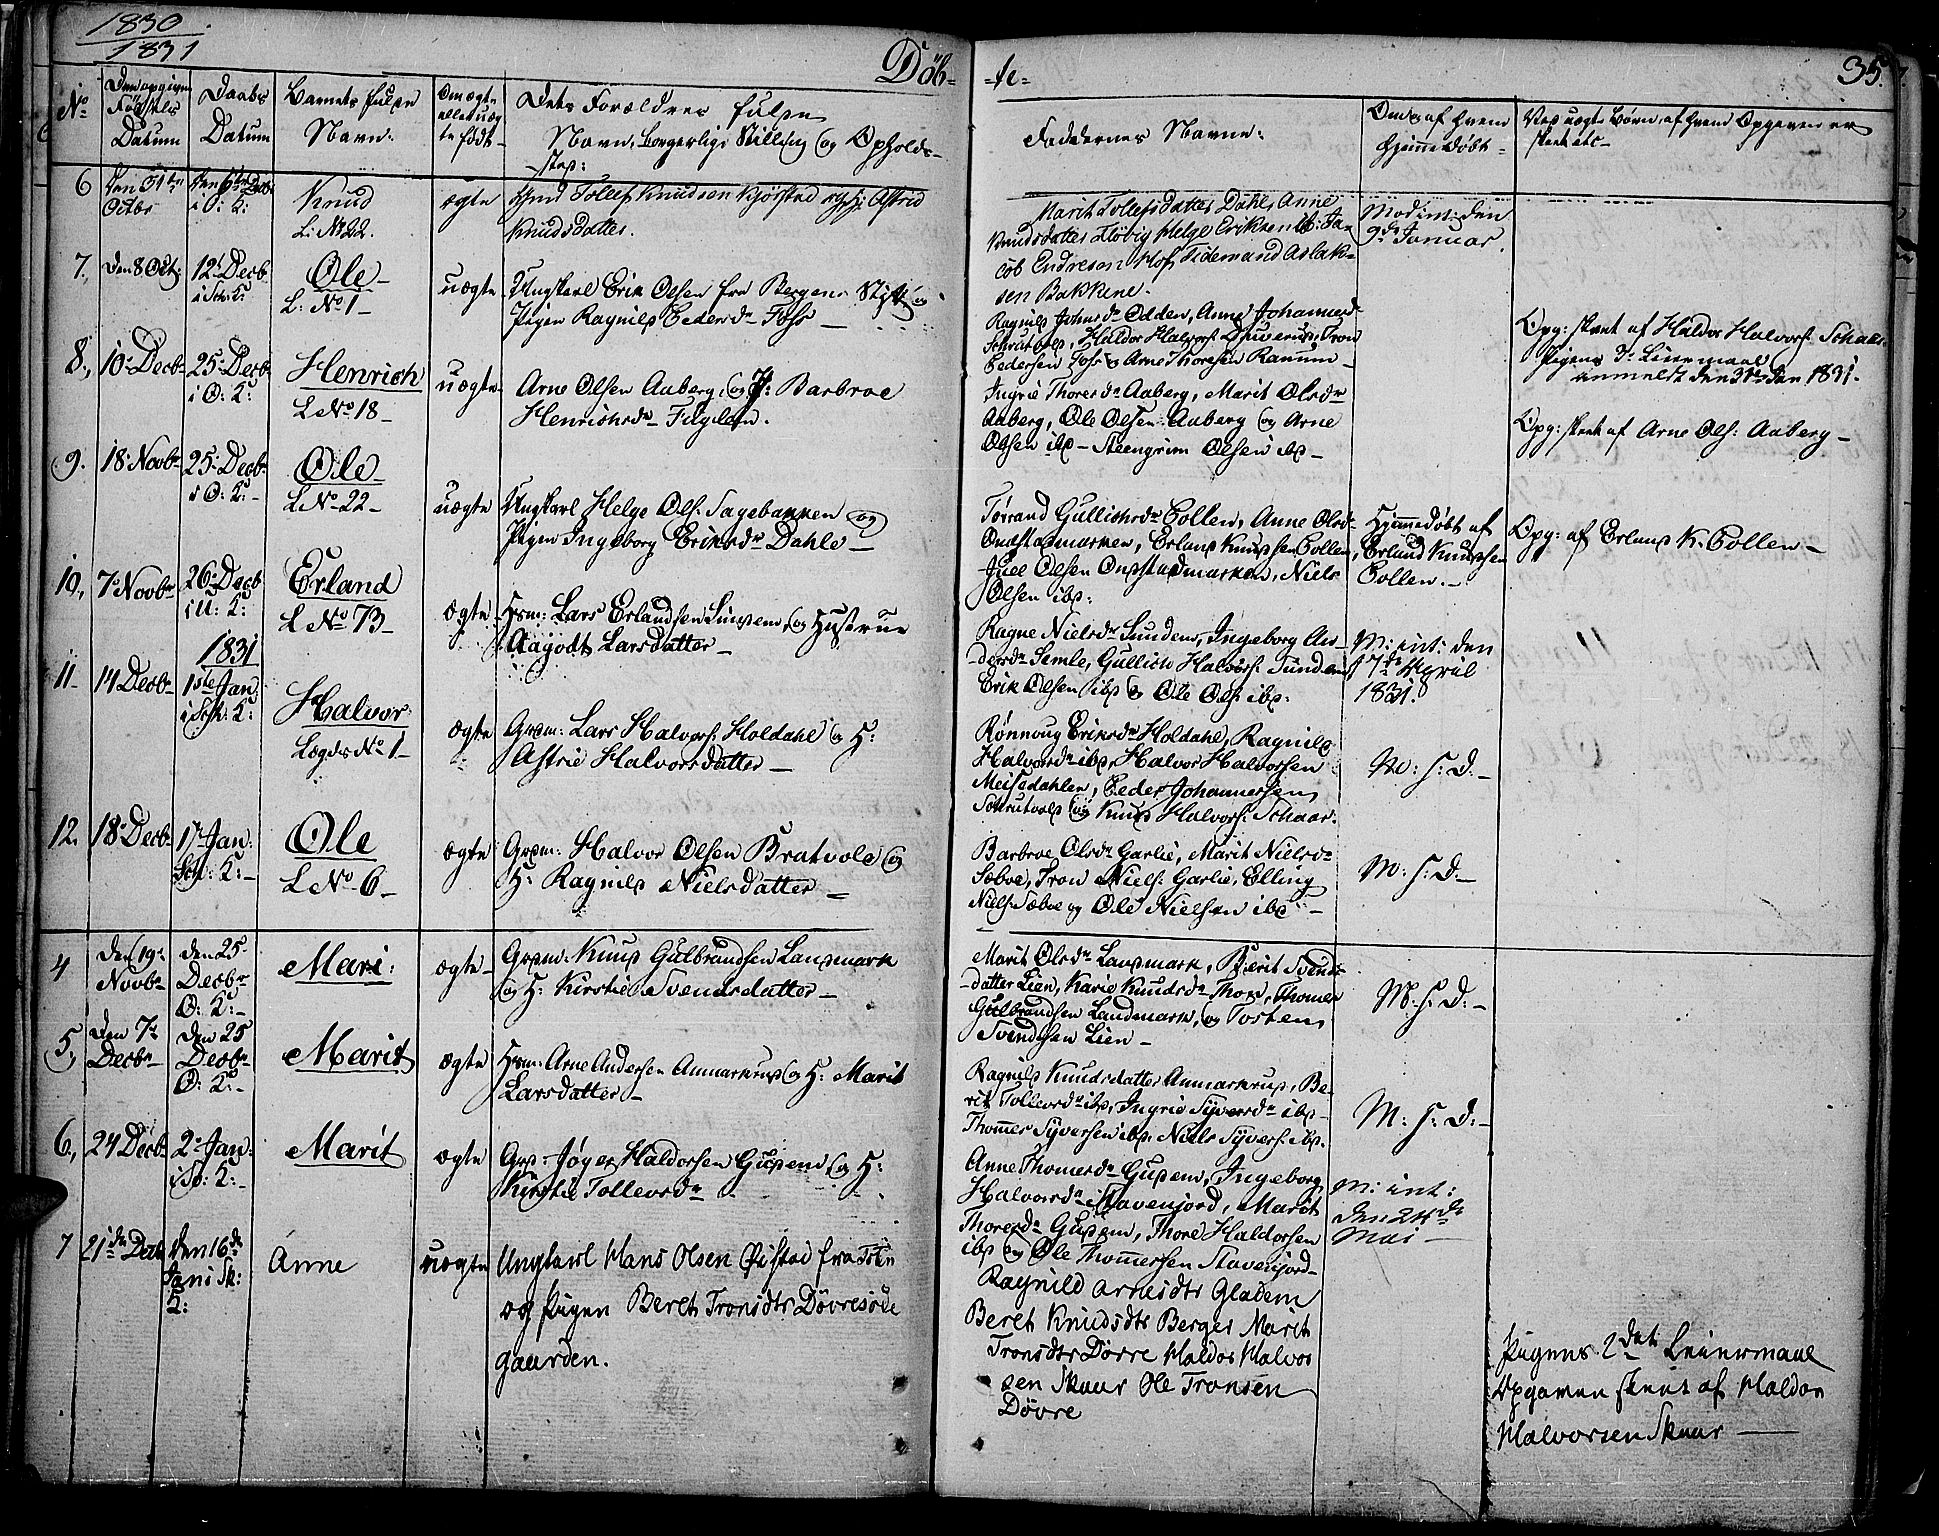 SAH, Nord-Aurdal prestekontor, Ministerialbok nr. 3, 1828-1841, s. 35